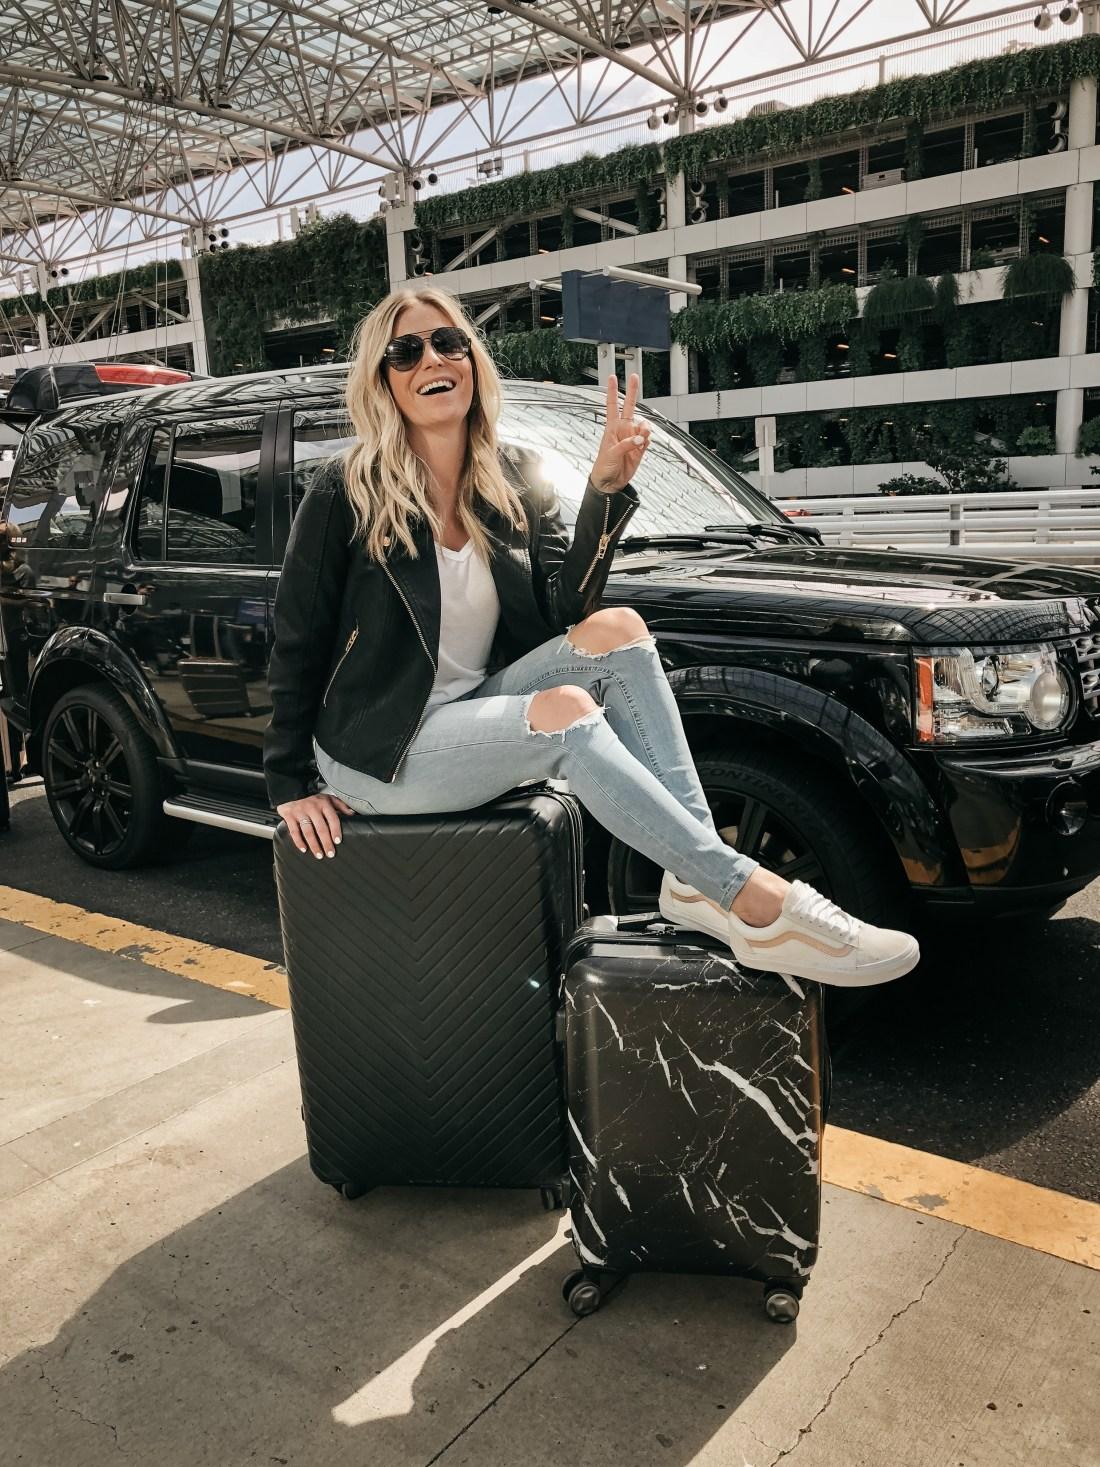 Chevron 29-Inch Spinner Suitcase NORDSTROM